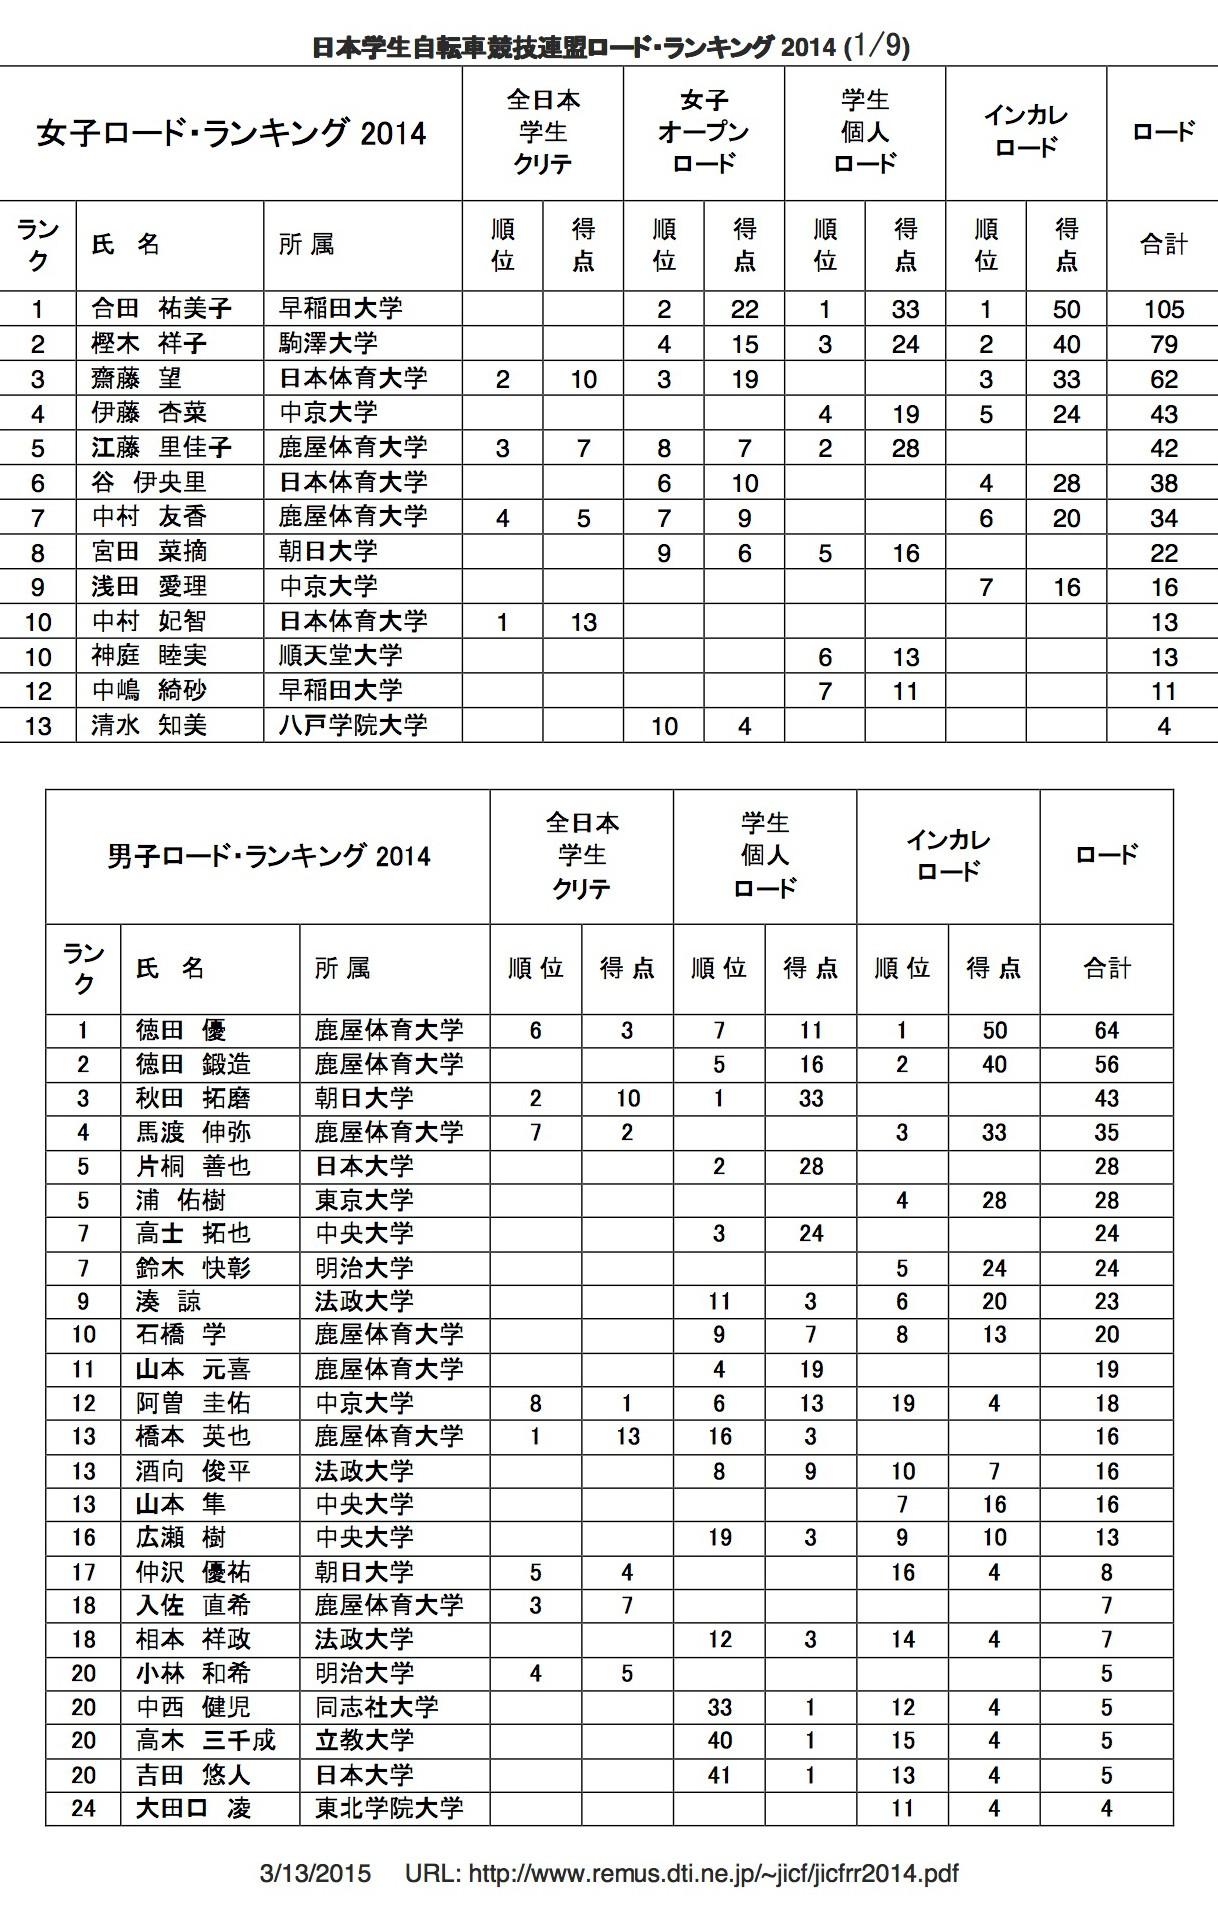 rr_rank_2014_01